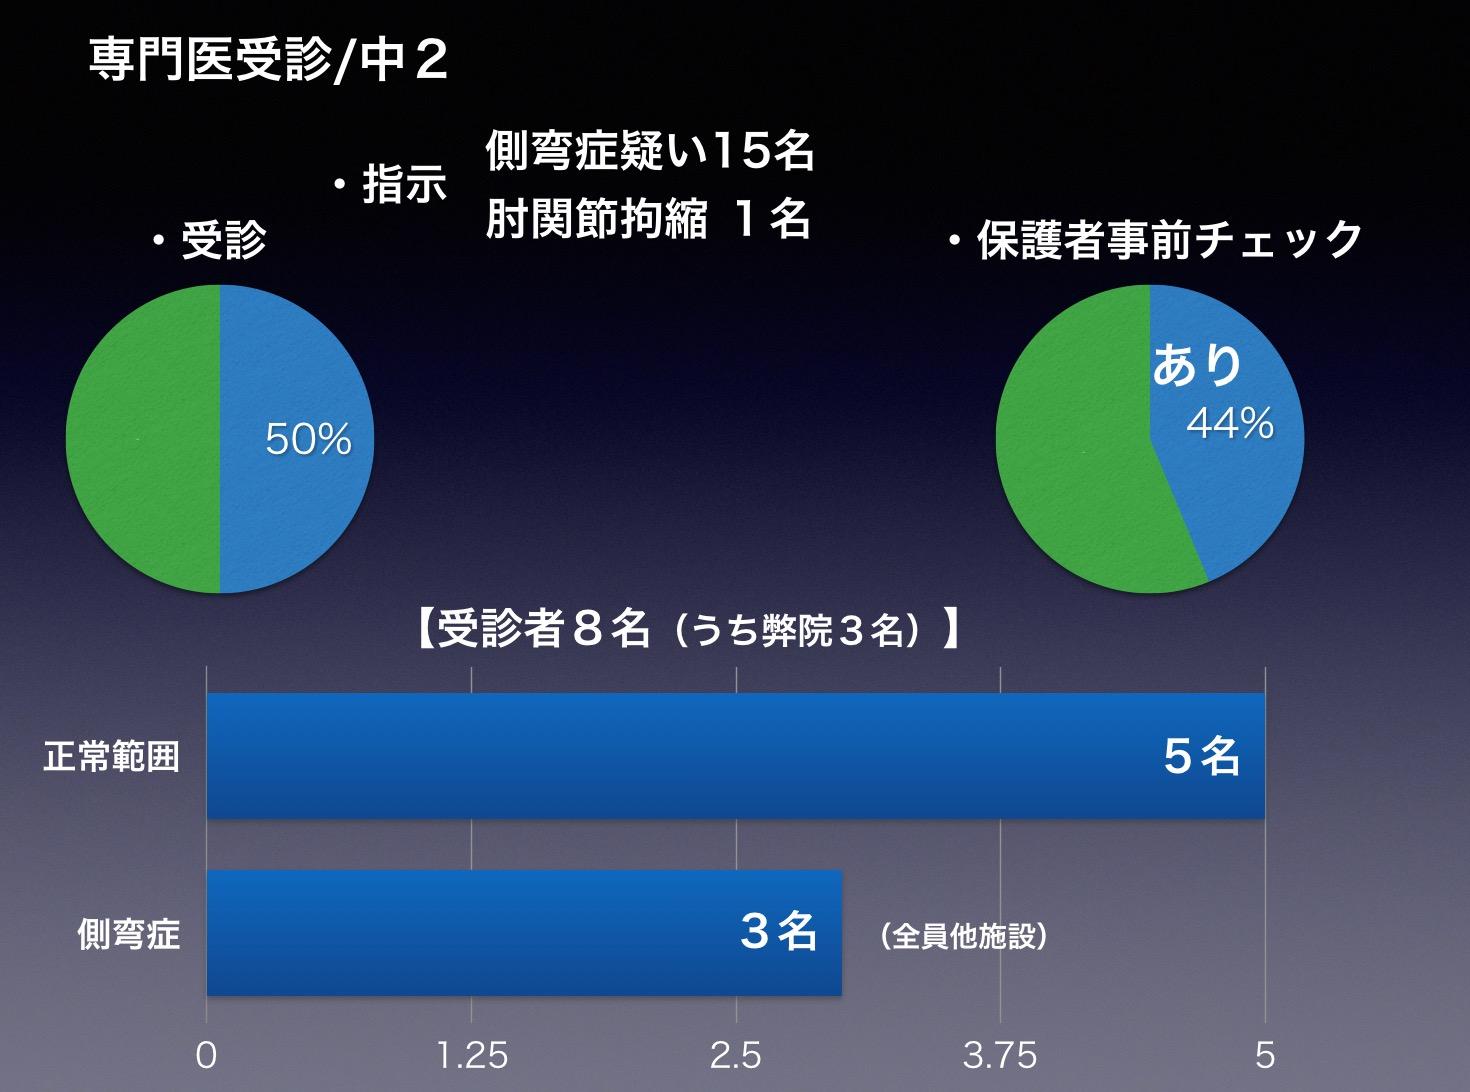 %e3%82%b9%e3%82%af%e3%83%aa%e3%83%bc%e3%83%b3%e3%82%b7%e3%83%a7%e3%83%83%e3%83%88-2016-09-08-10-01-13